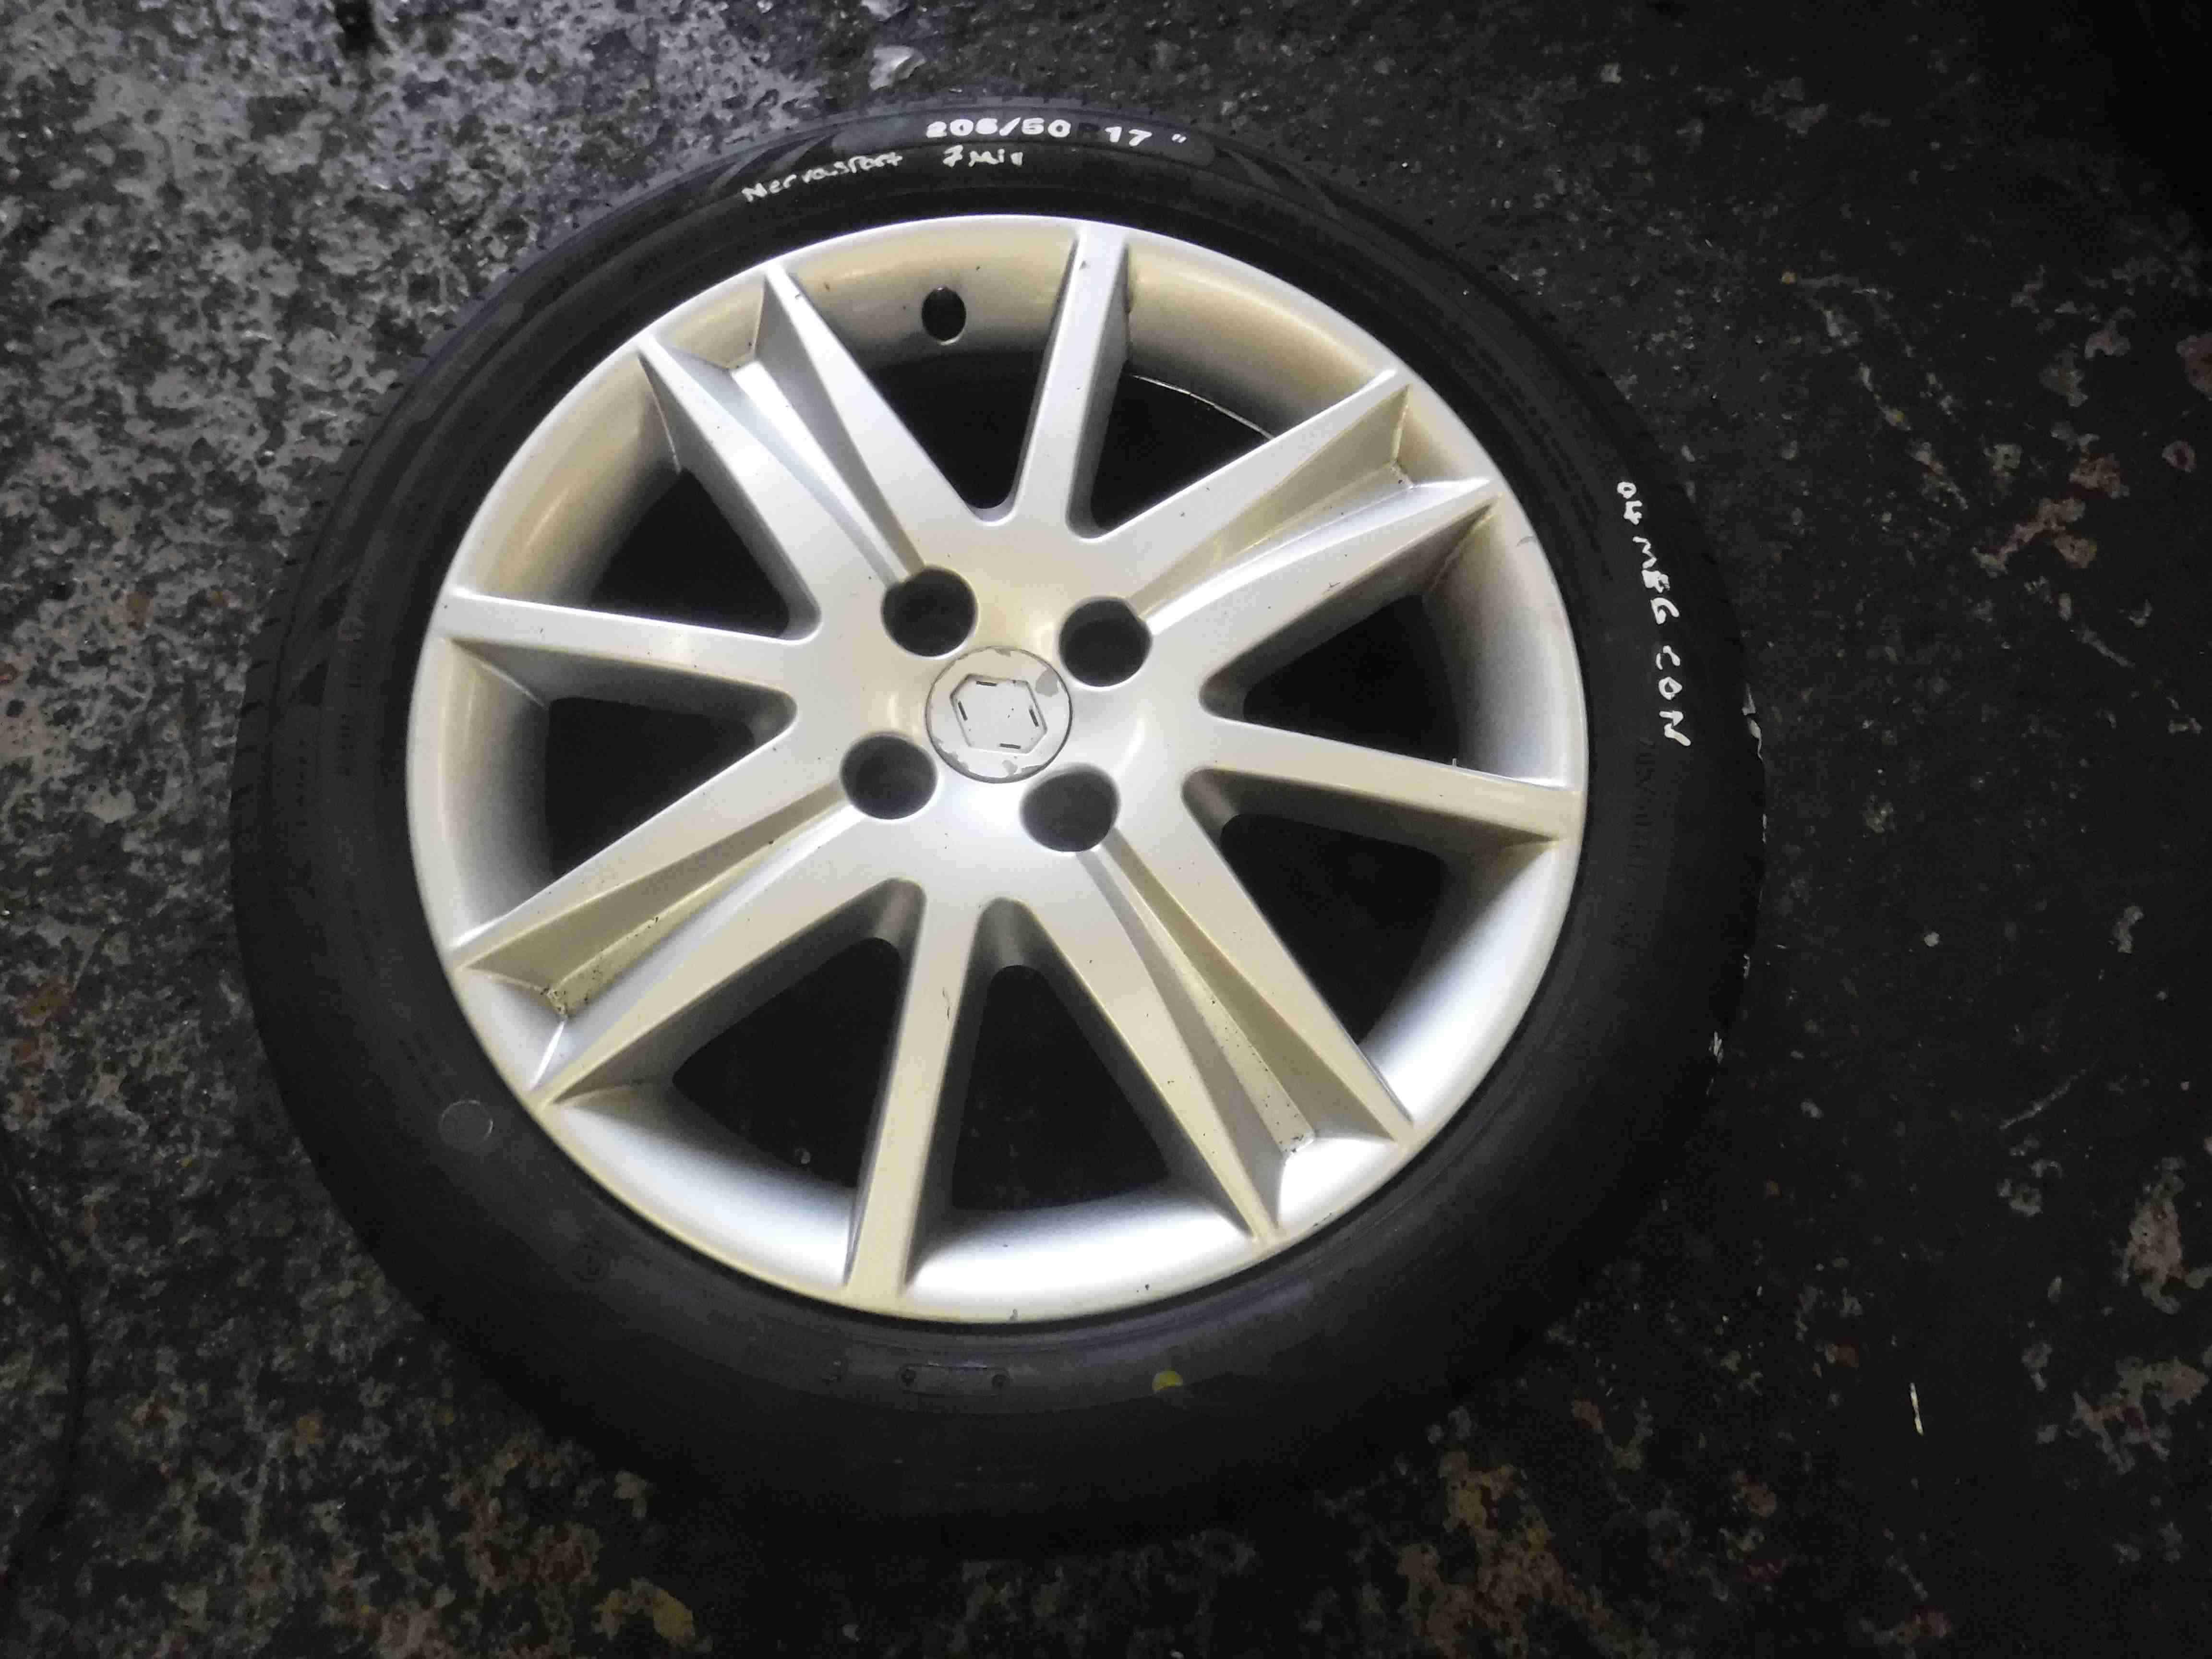 Renault Megane 2002-2008 Nervasport Alloy Wheel + Tyre 205 50 17 7mm 4/5